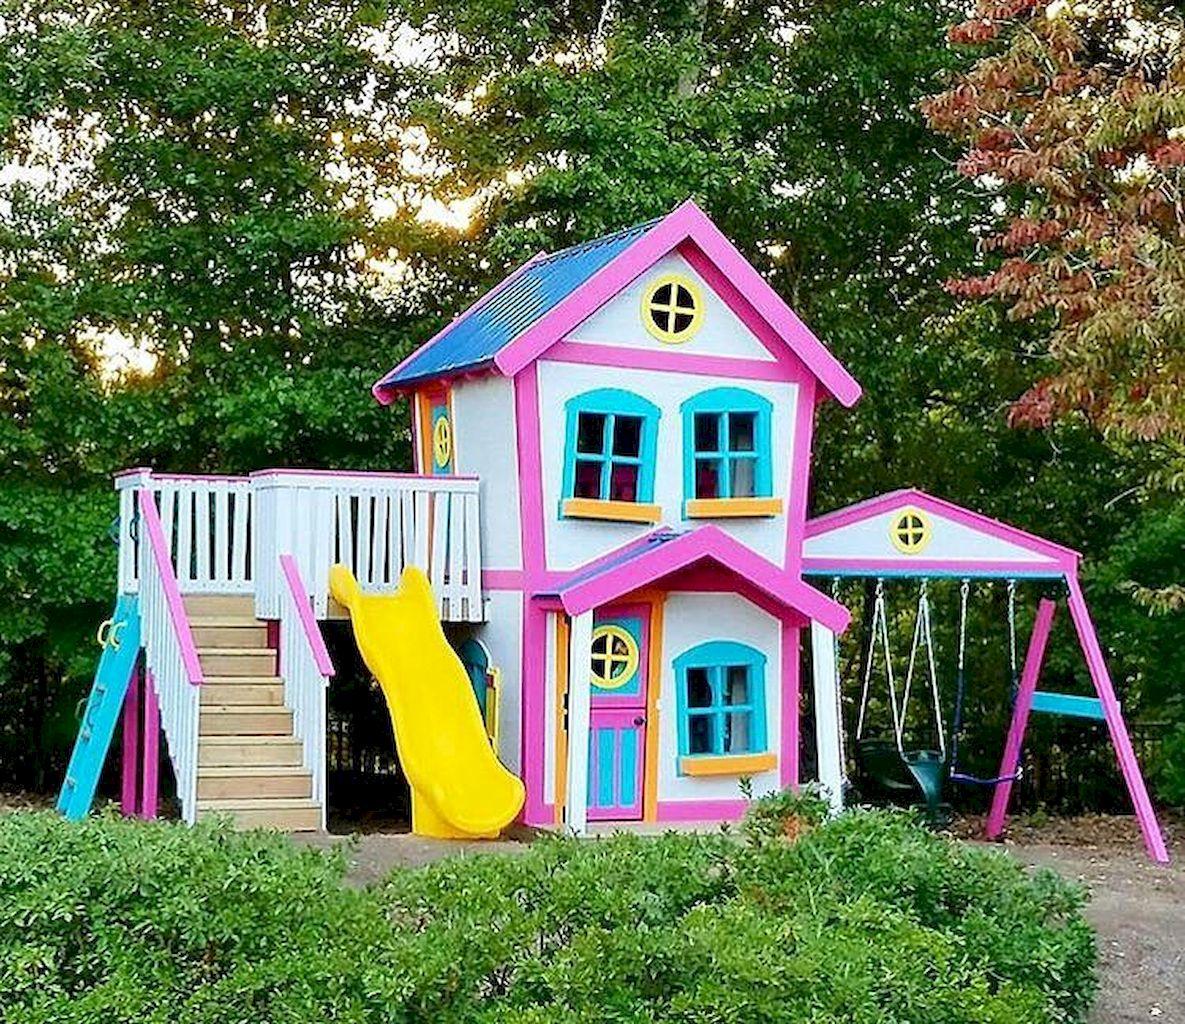 Ravishing Playhouse Plan Into Your Existing Backyard Space